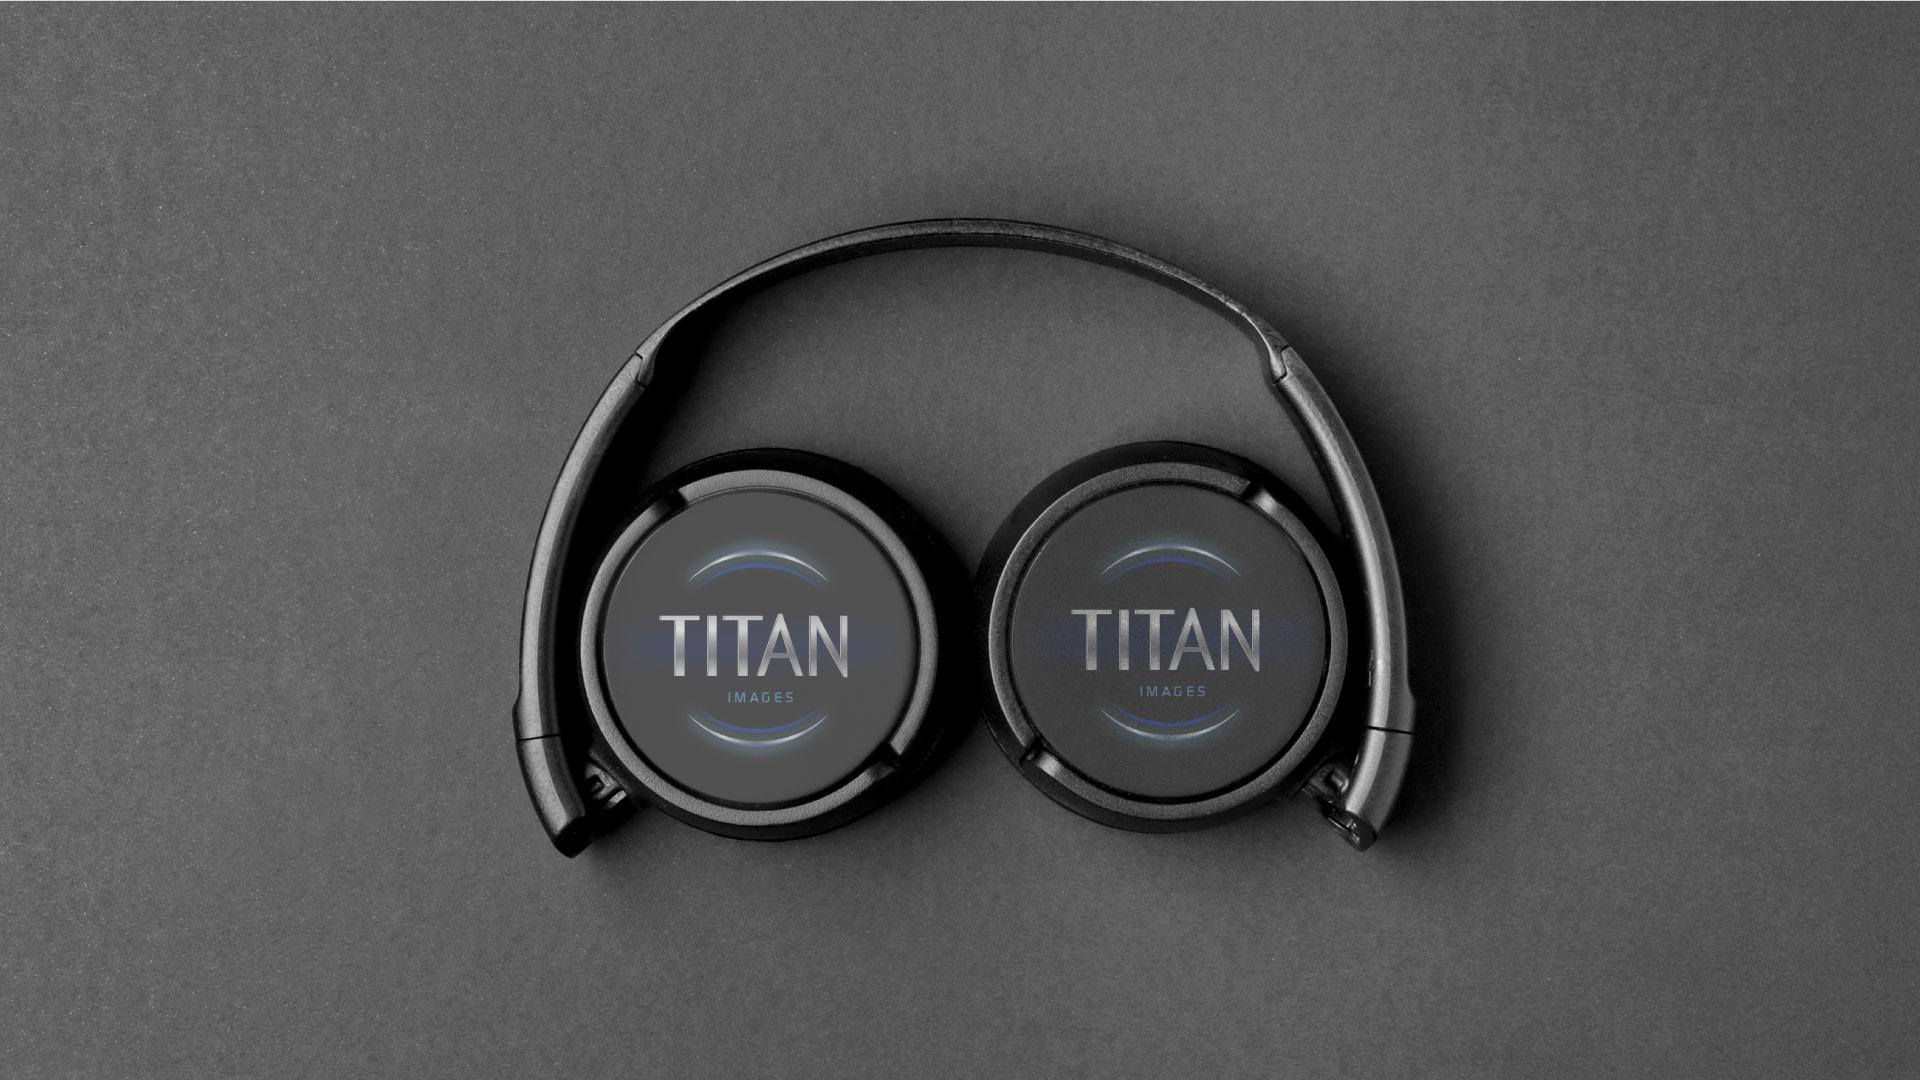 titan-brand-logo-design-by-mapleweb-vancouver-canada-head-phone-mock